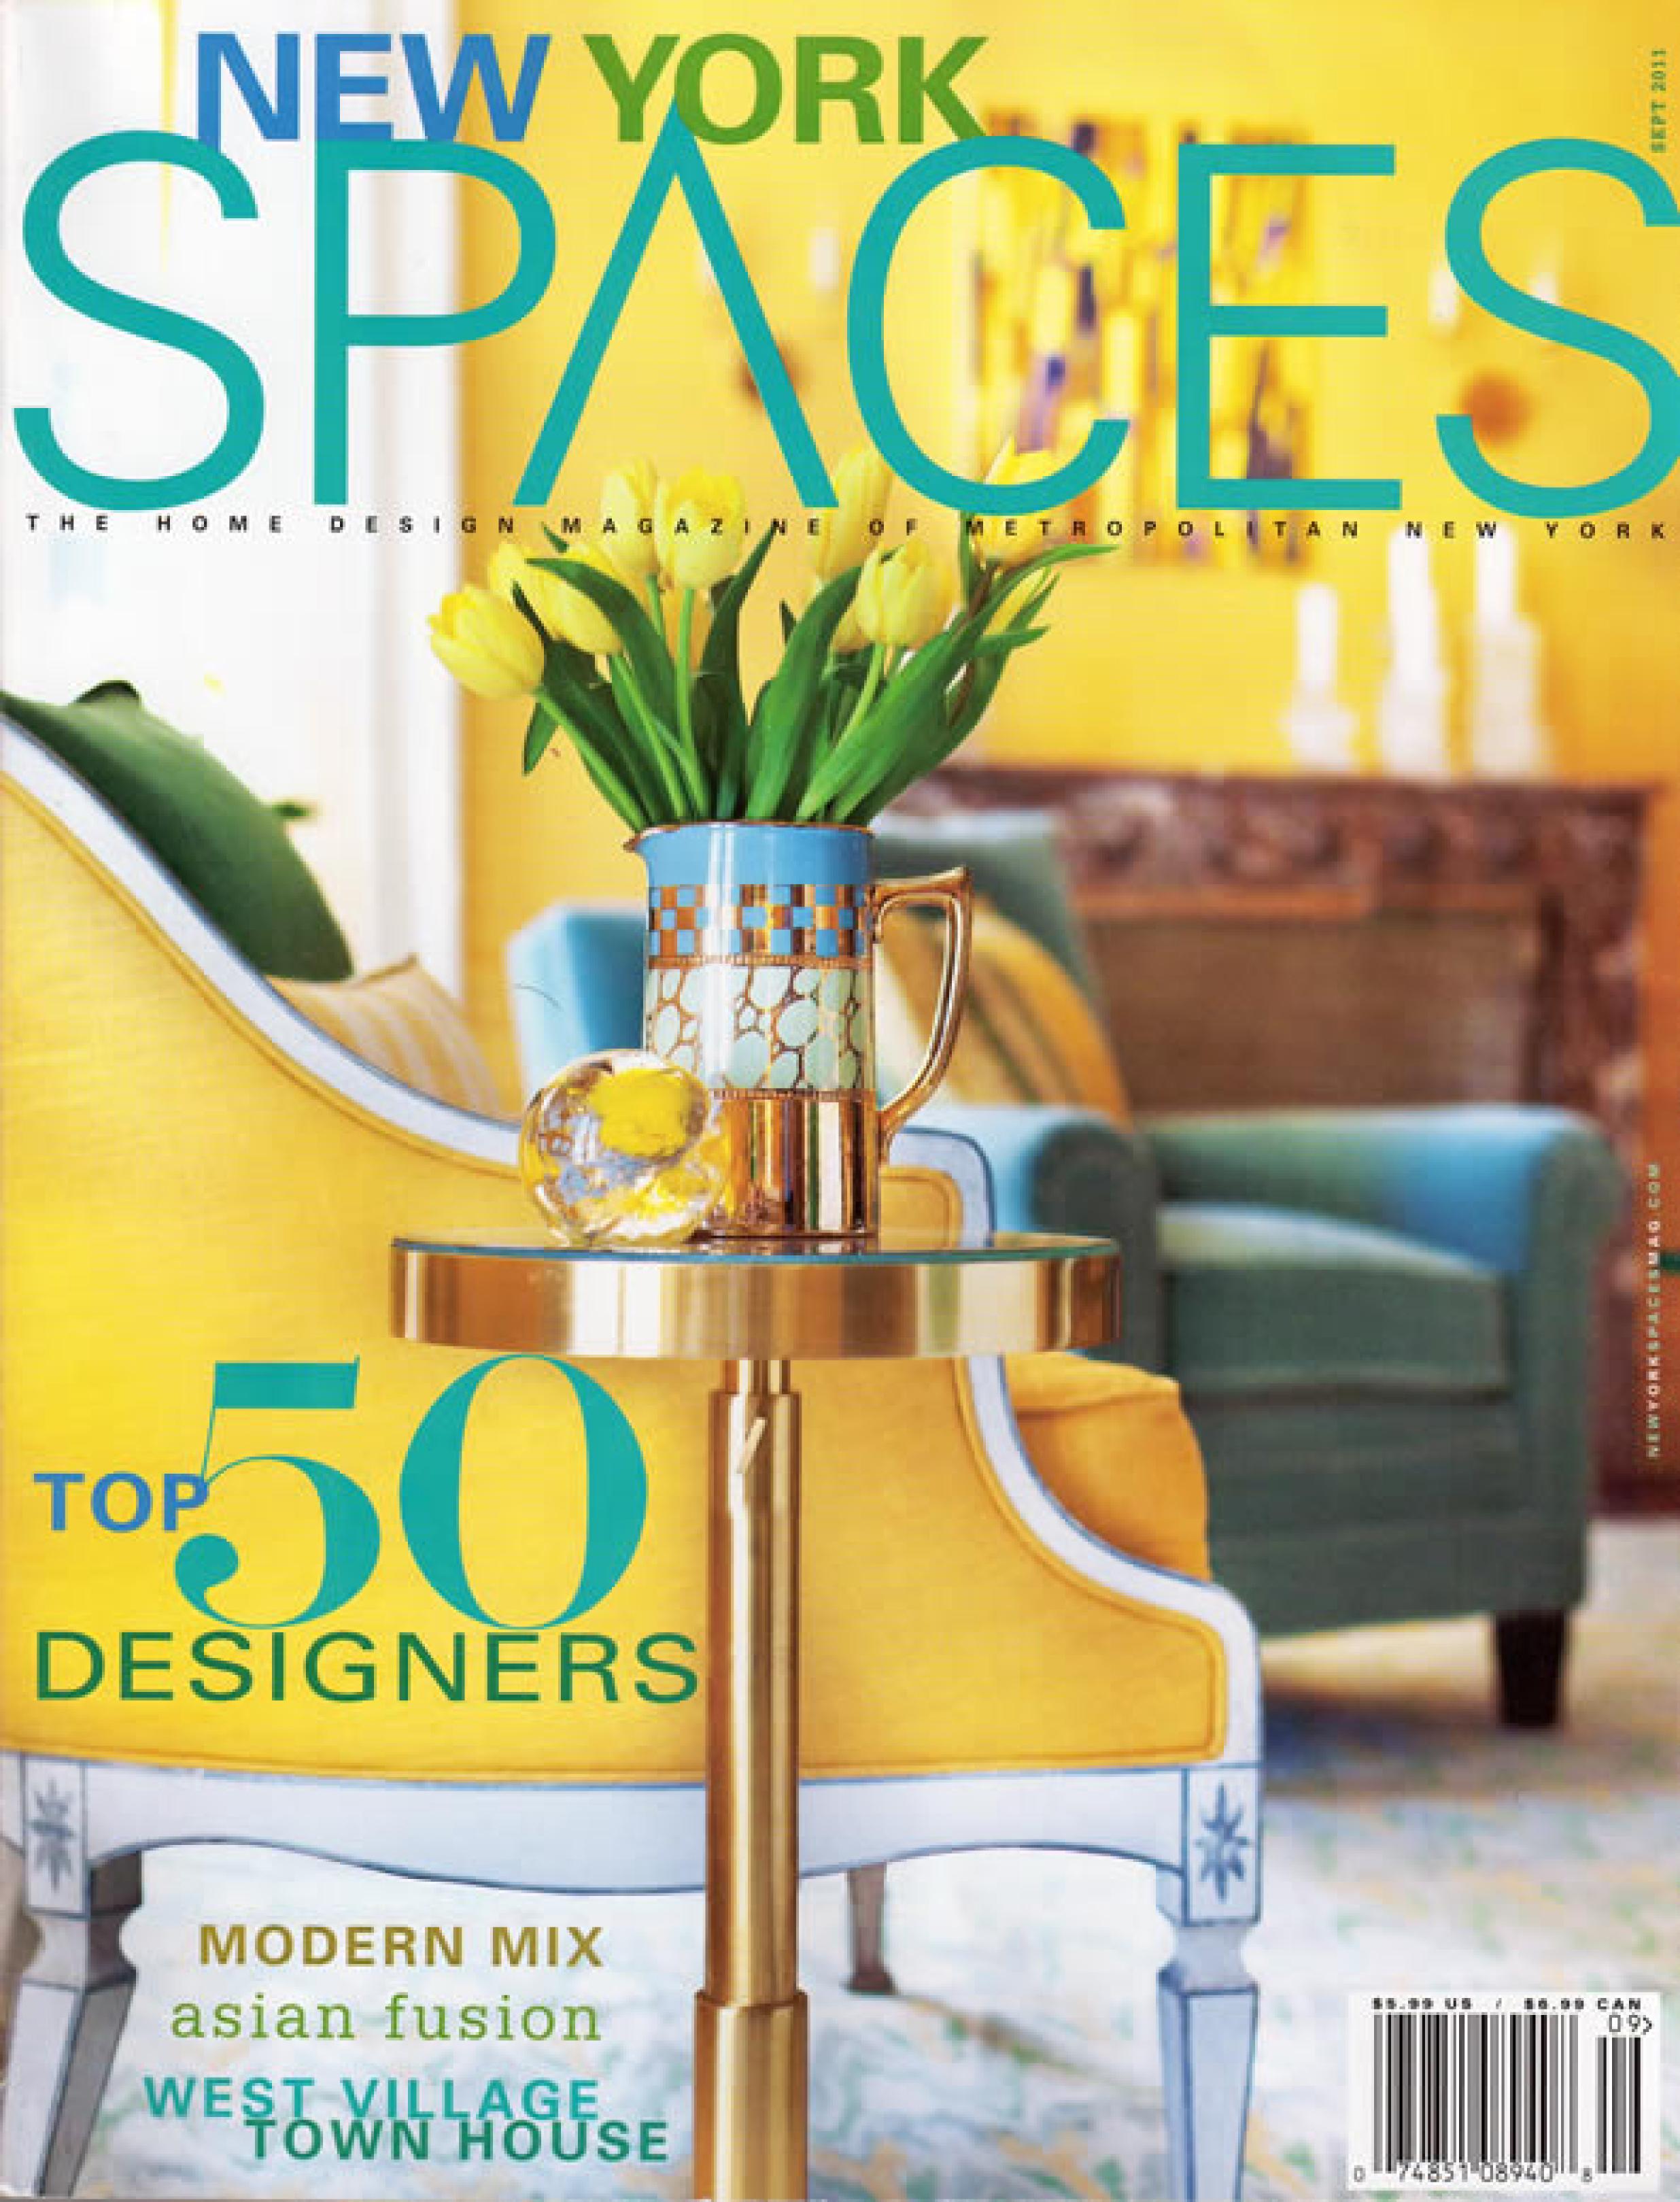 New_York_Spaces_2011_Top_50_Designers-1.jpg